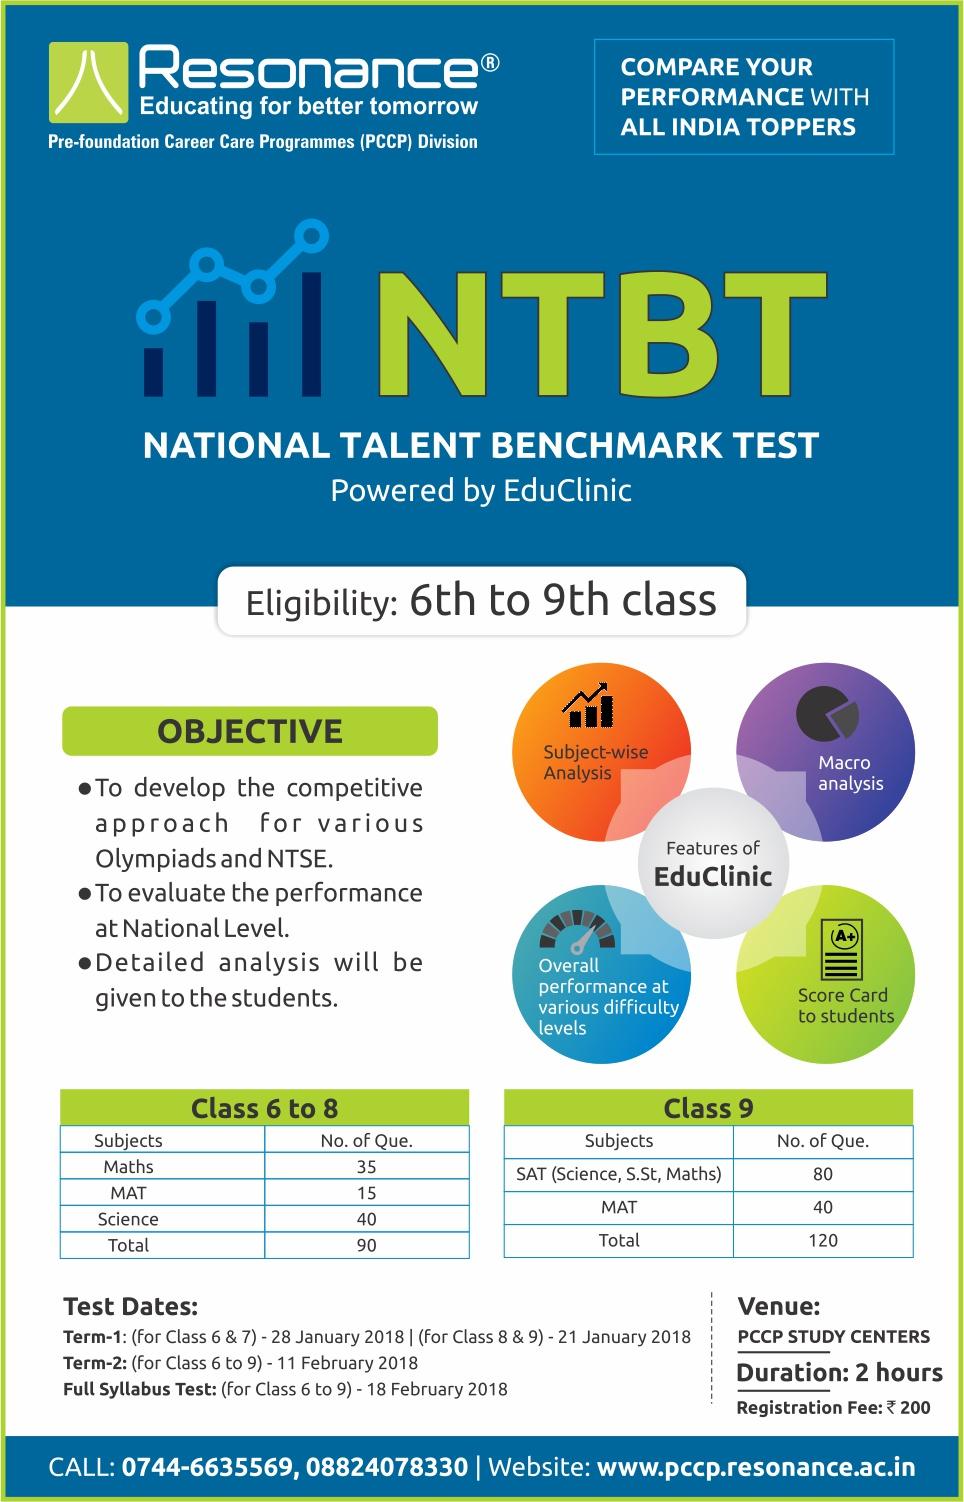 NTBT - National Talent Benchmarking Test